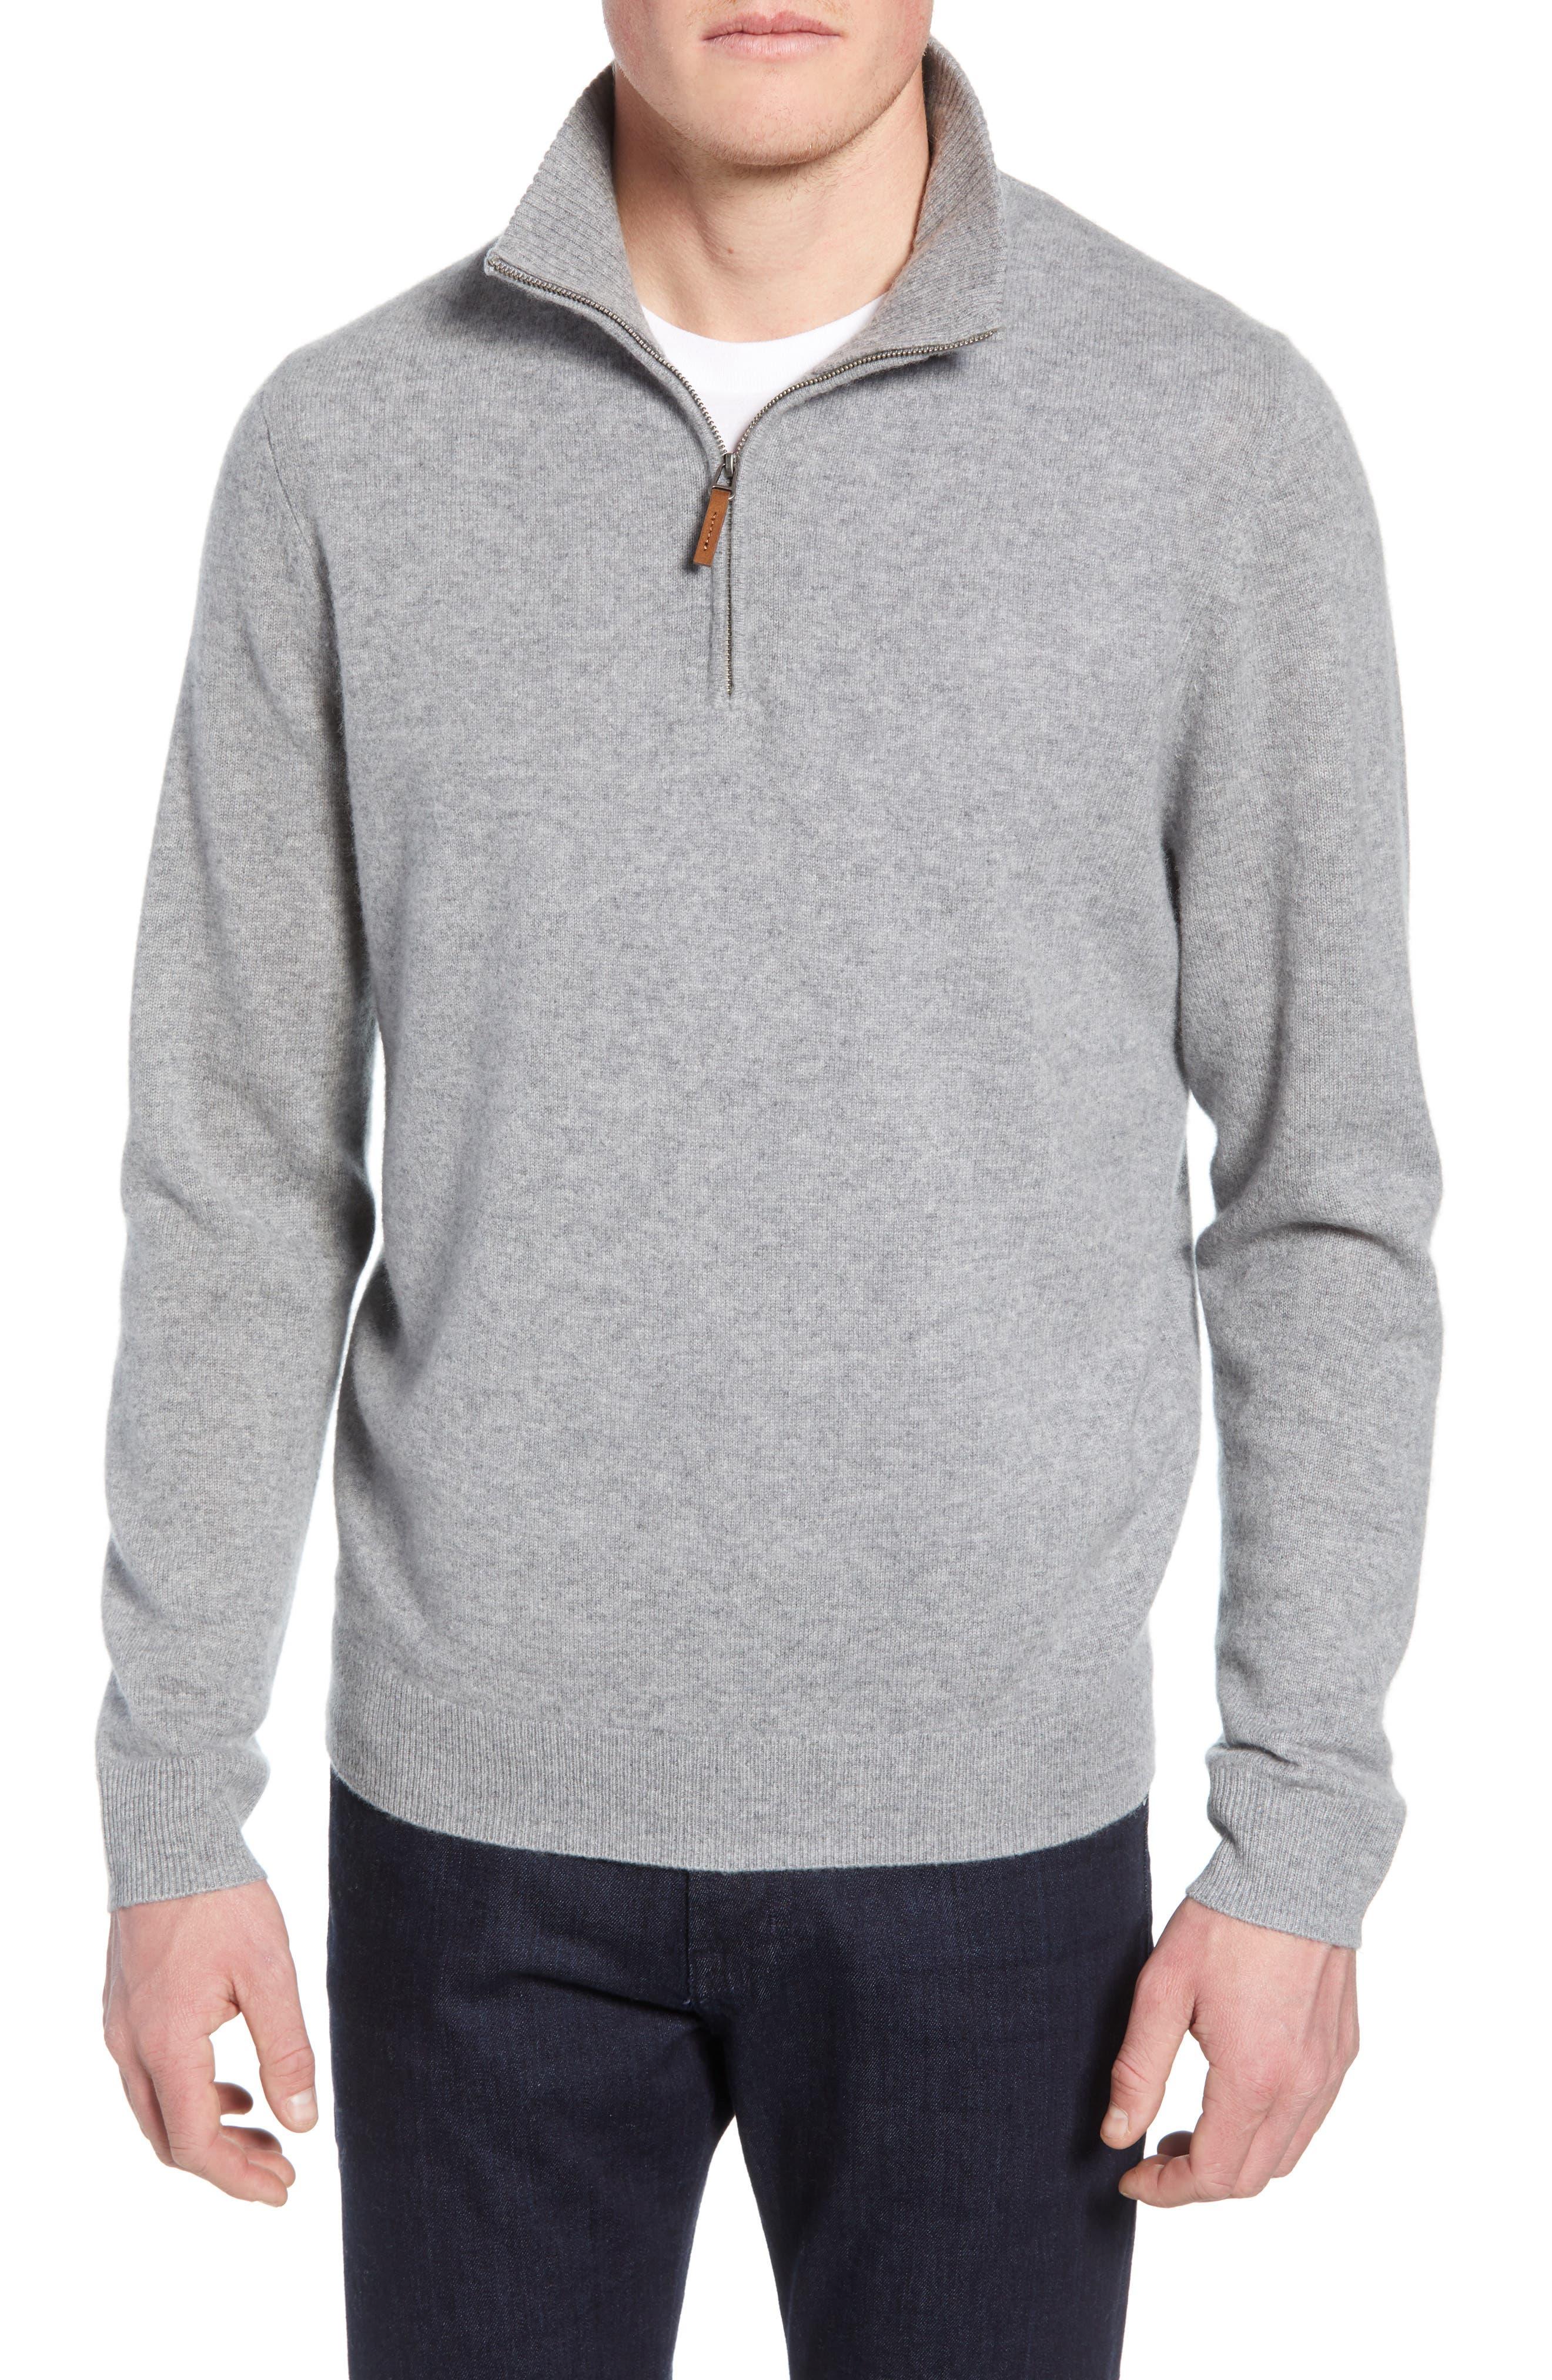 NORDSTROM MEN'S SHOP, Regular Fit Cashmere Quarter Zip Pullover, Main thumbnail 1, color, GREY DRIFTWOOD